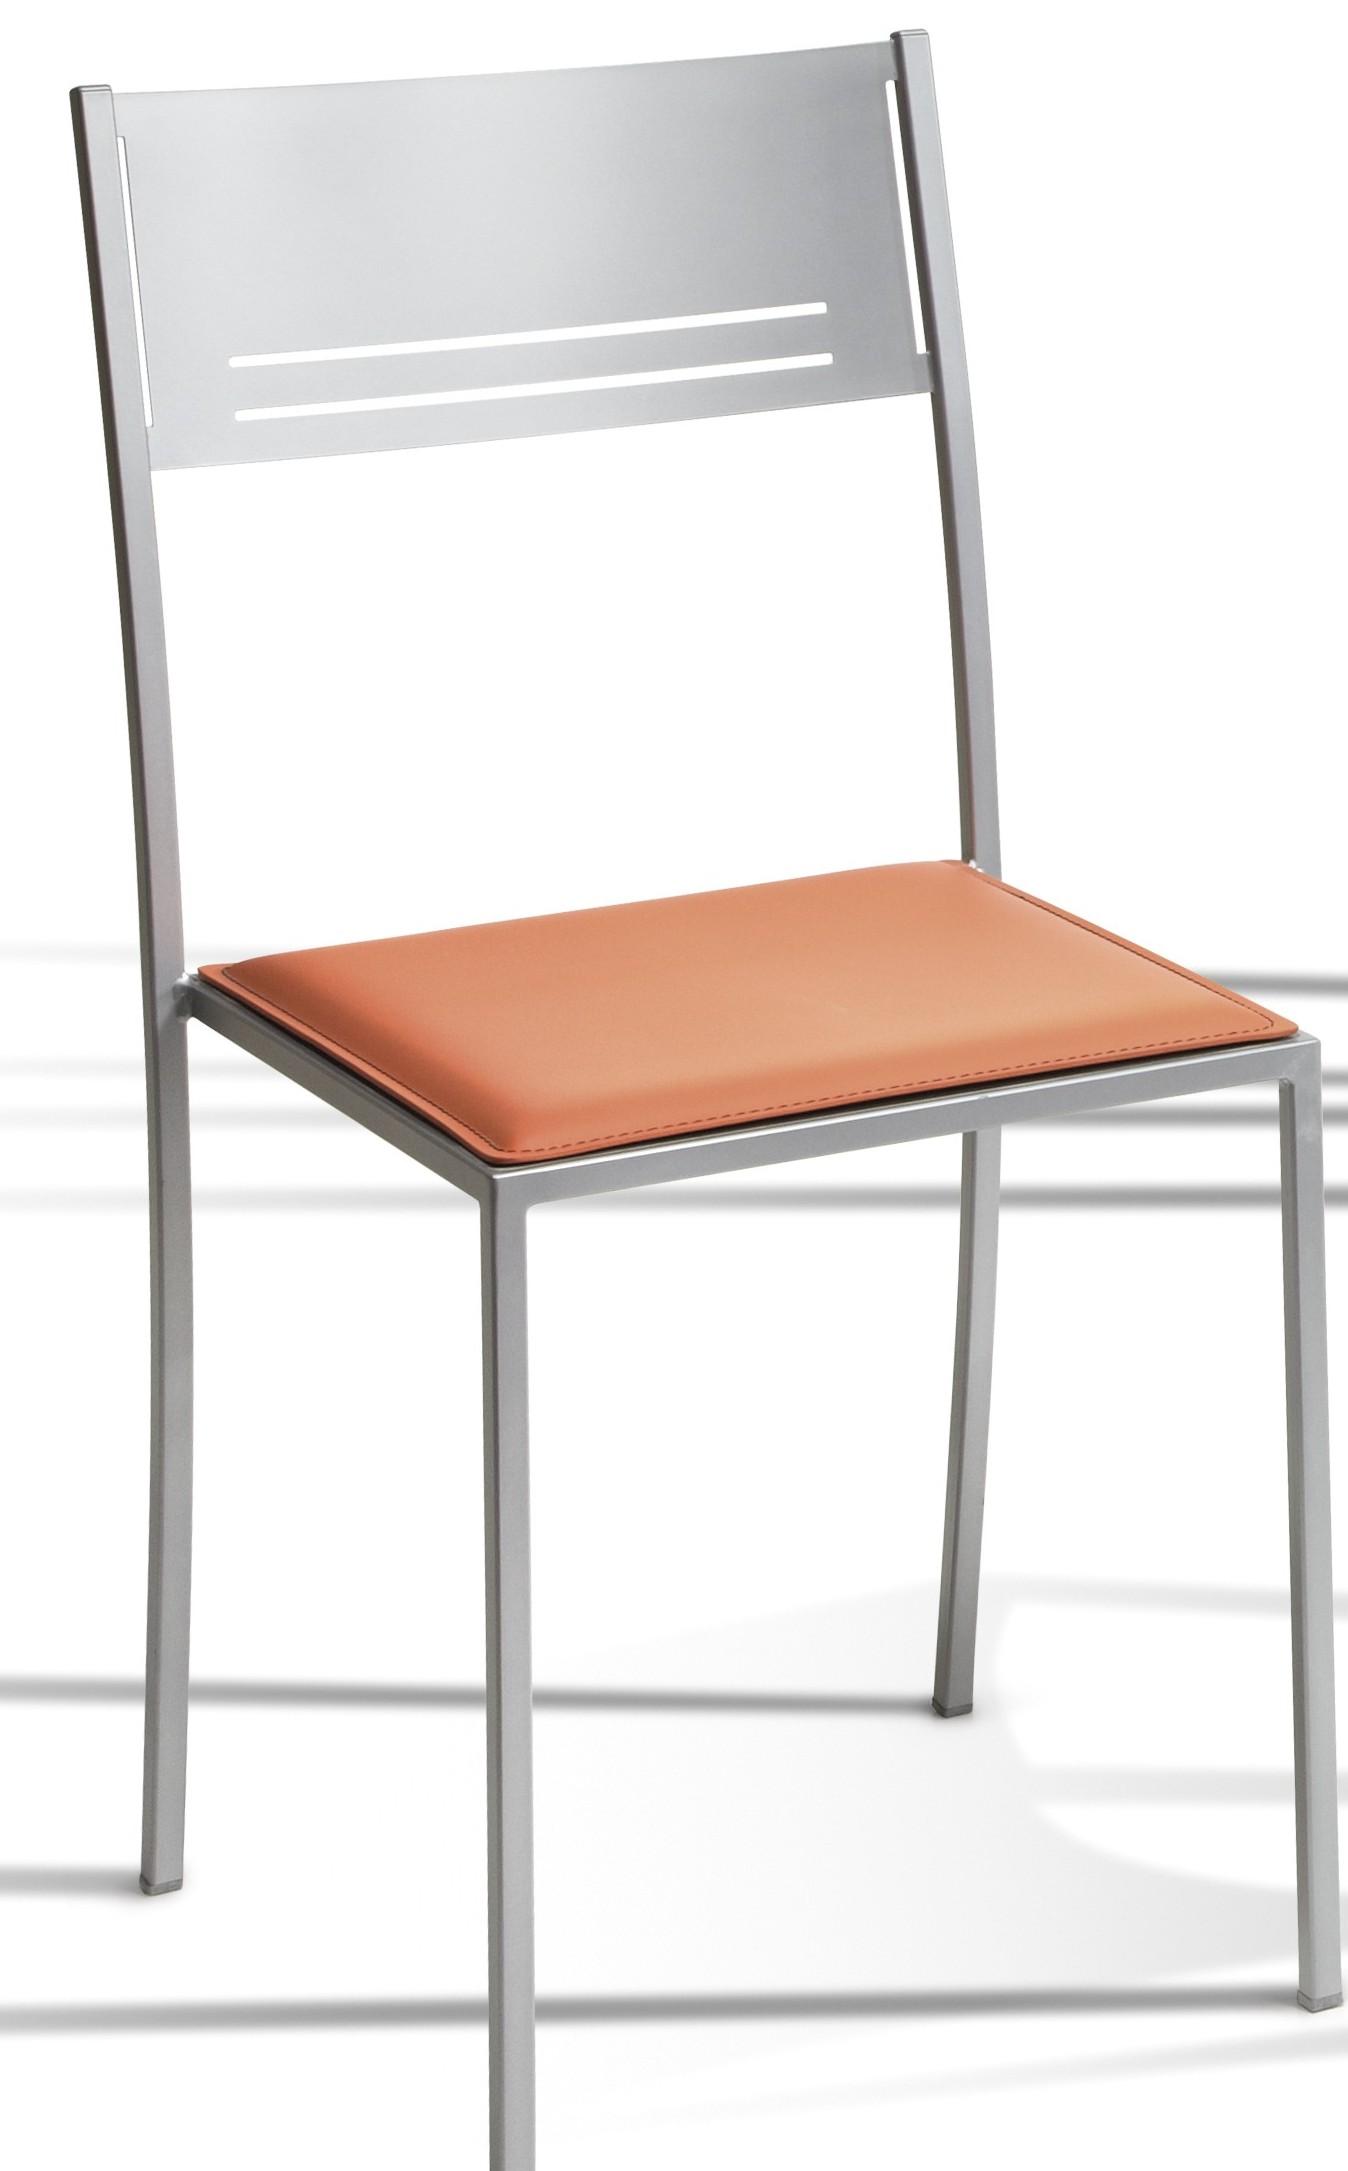 Mesas de cocina originales sillas de cocina modernas baratas for Sillas modernas baratas